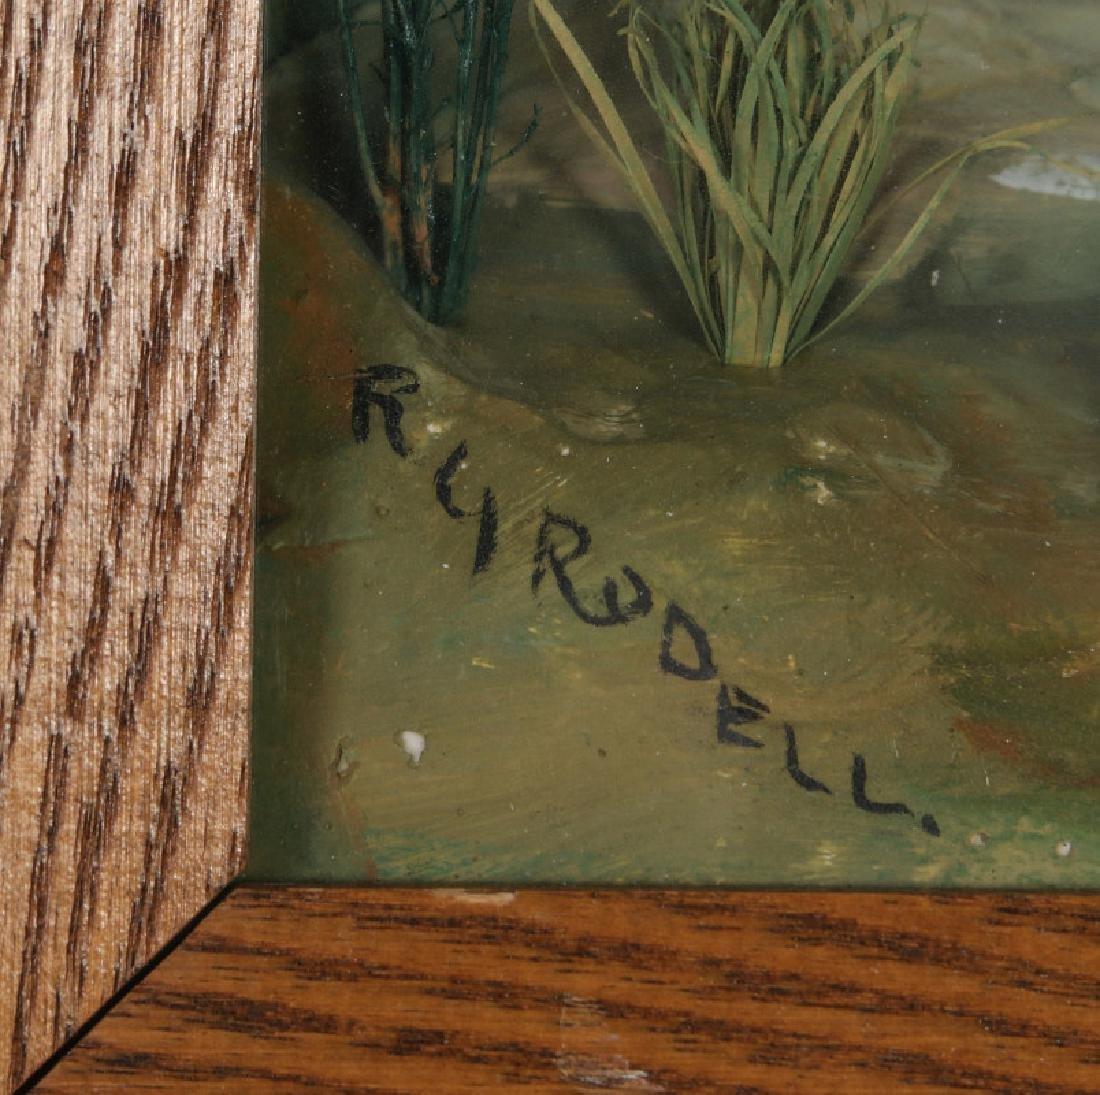 FOLK ART DIORAMA BY R.G. RODELL - LARGEMOUTH BASS - 7